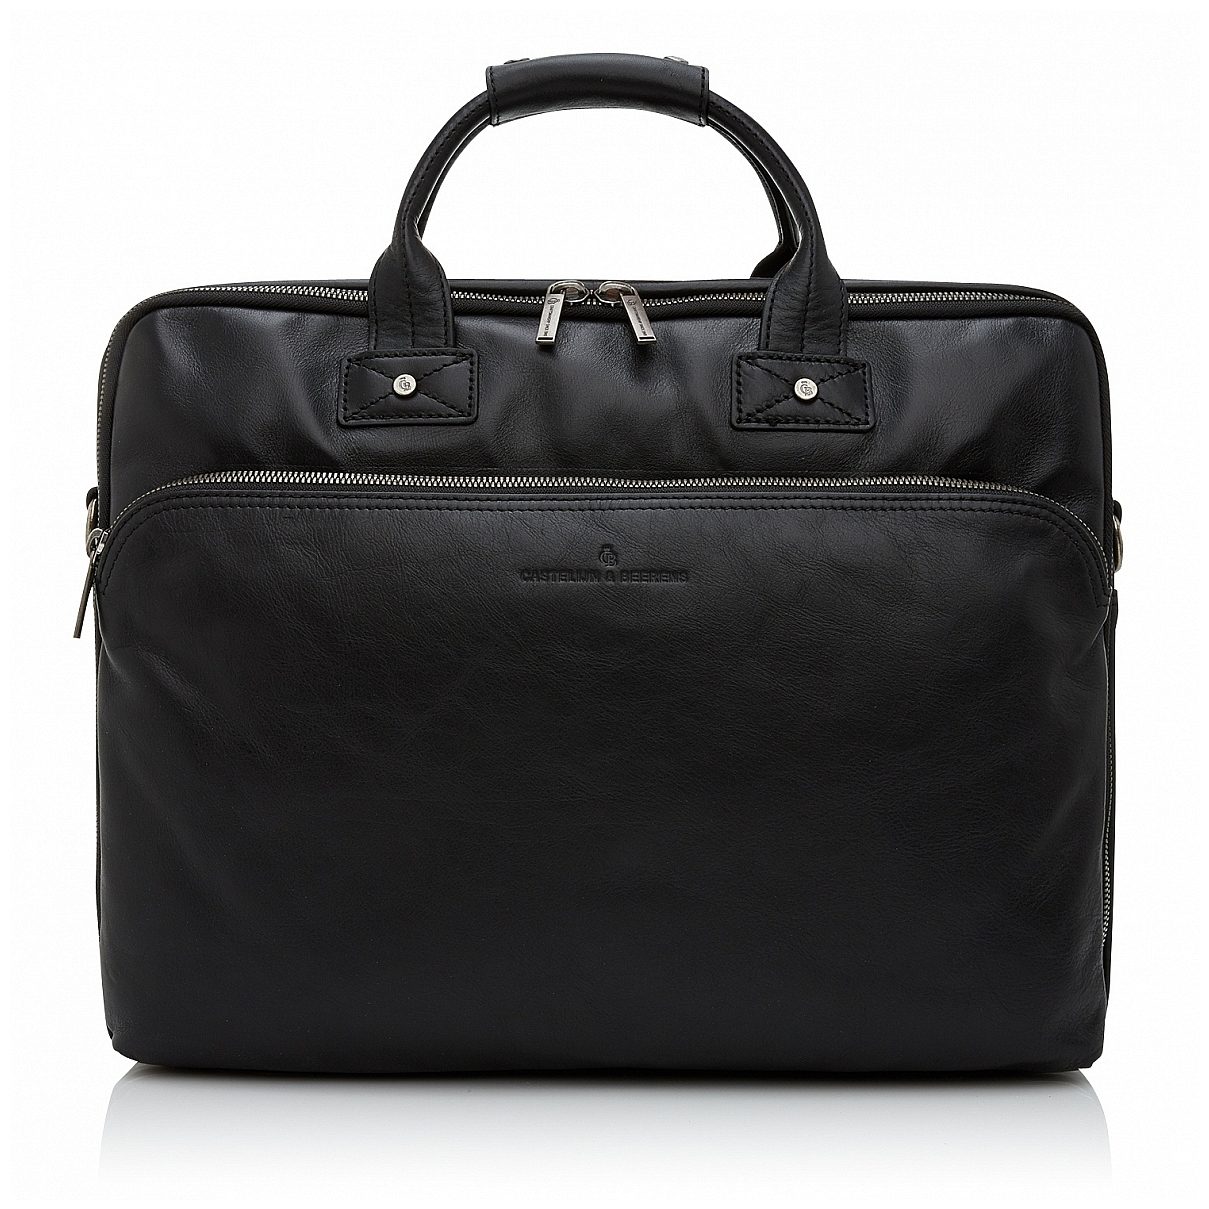 Castelijn & Beerens Kožená taška na notebook a tablet 609474 černá